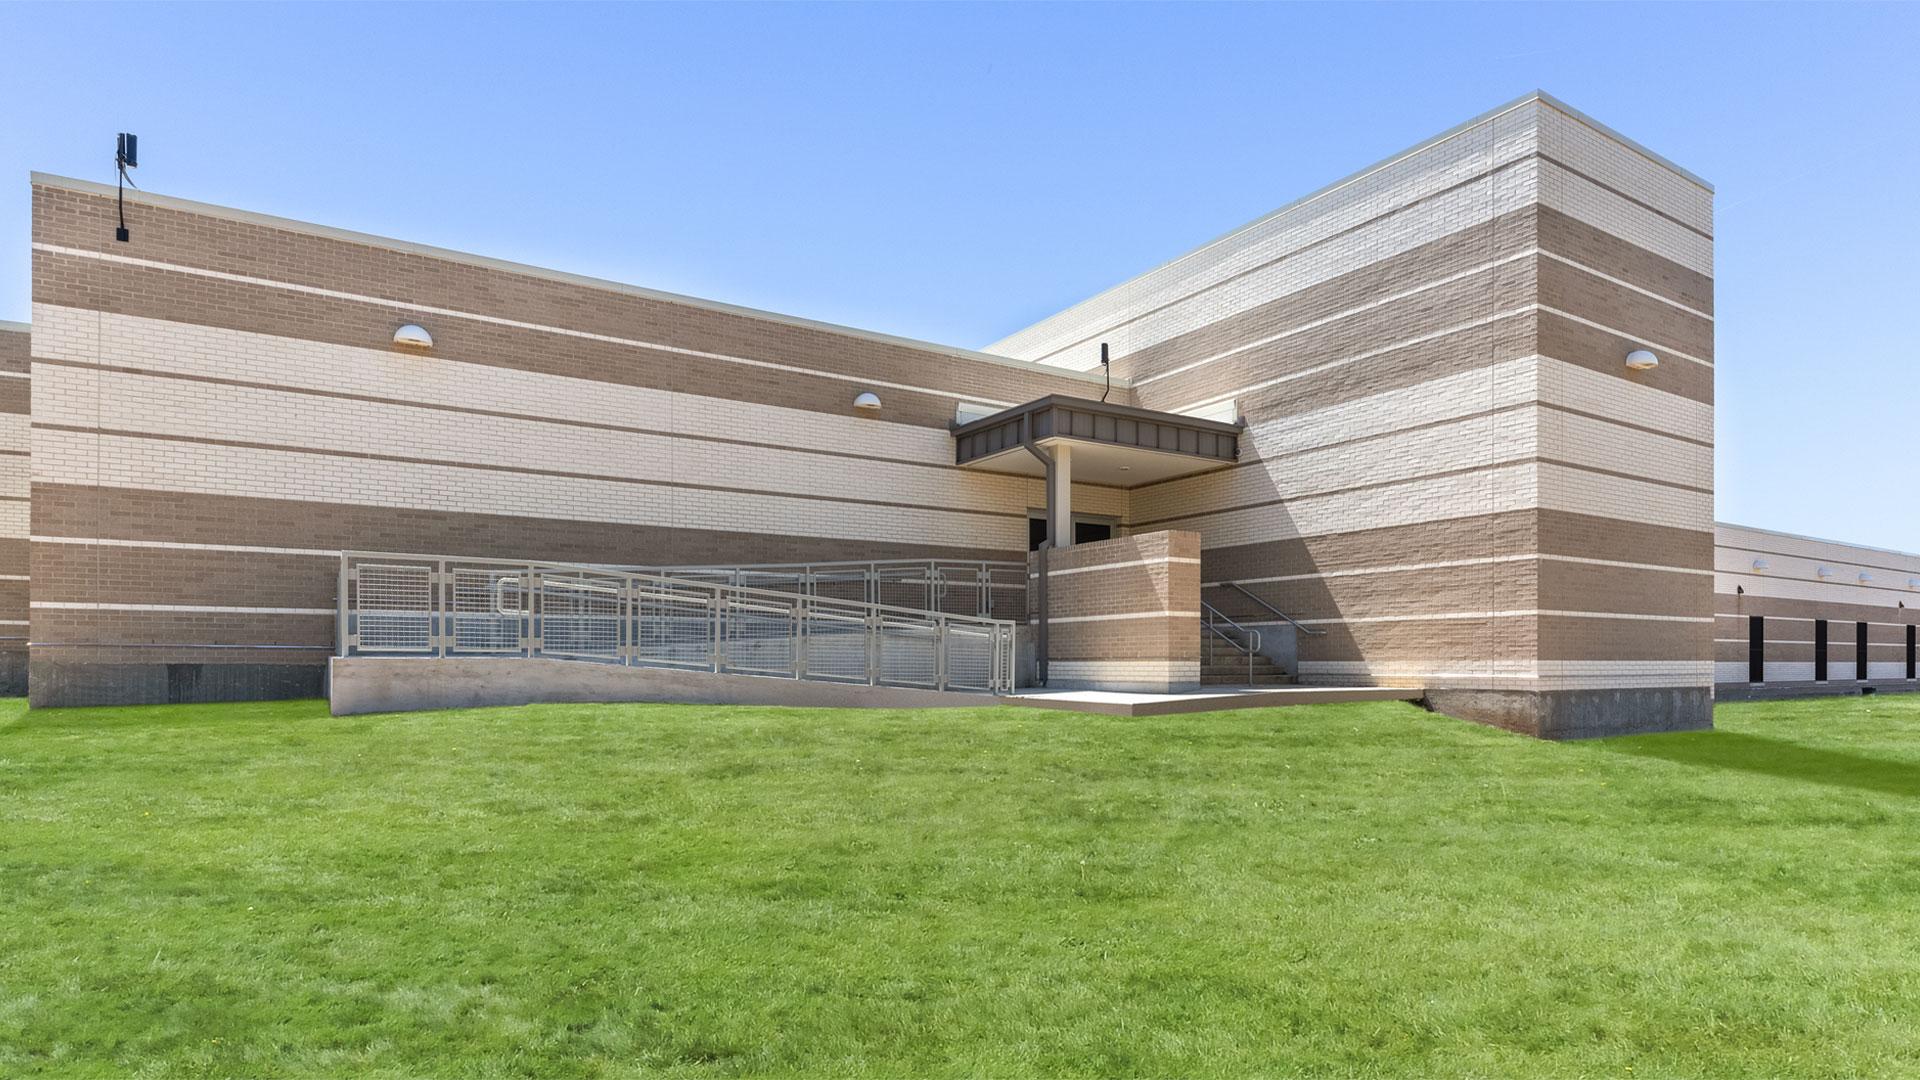 DISD: Grady Spruce High School